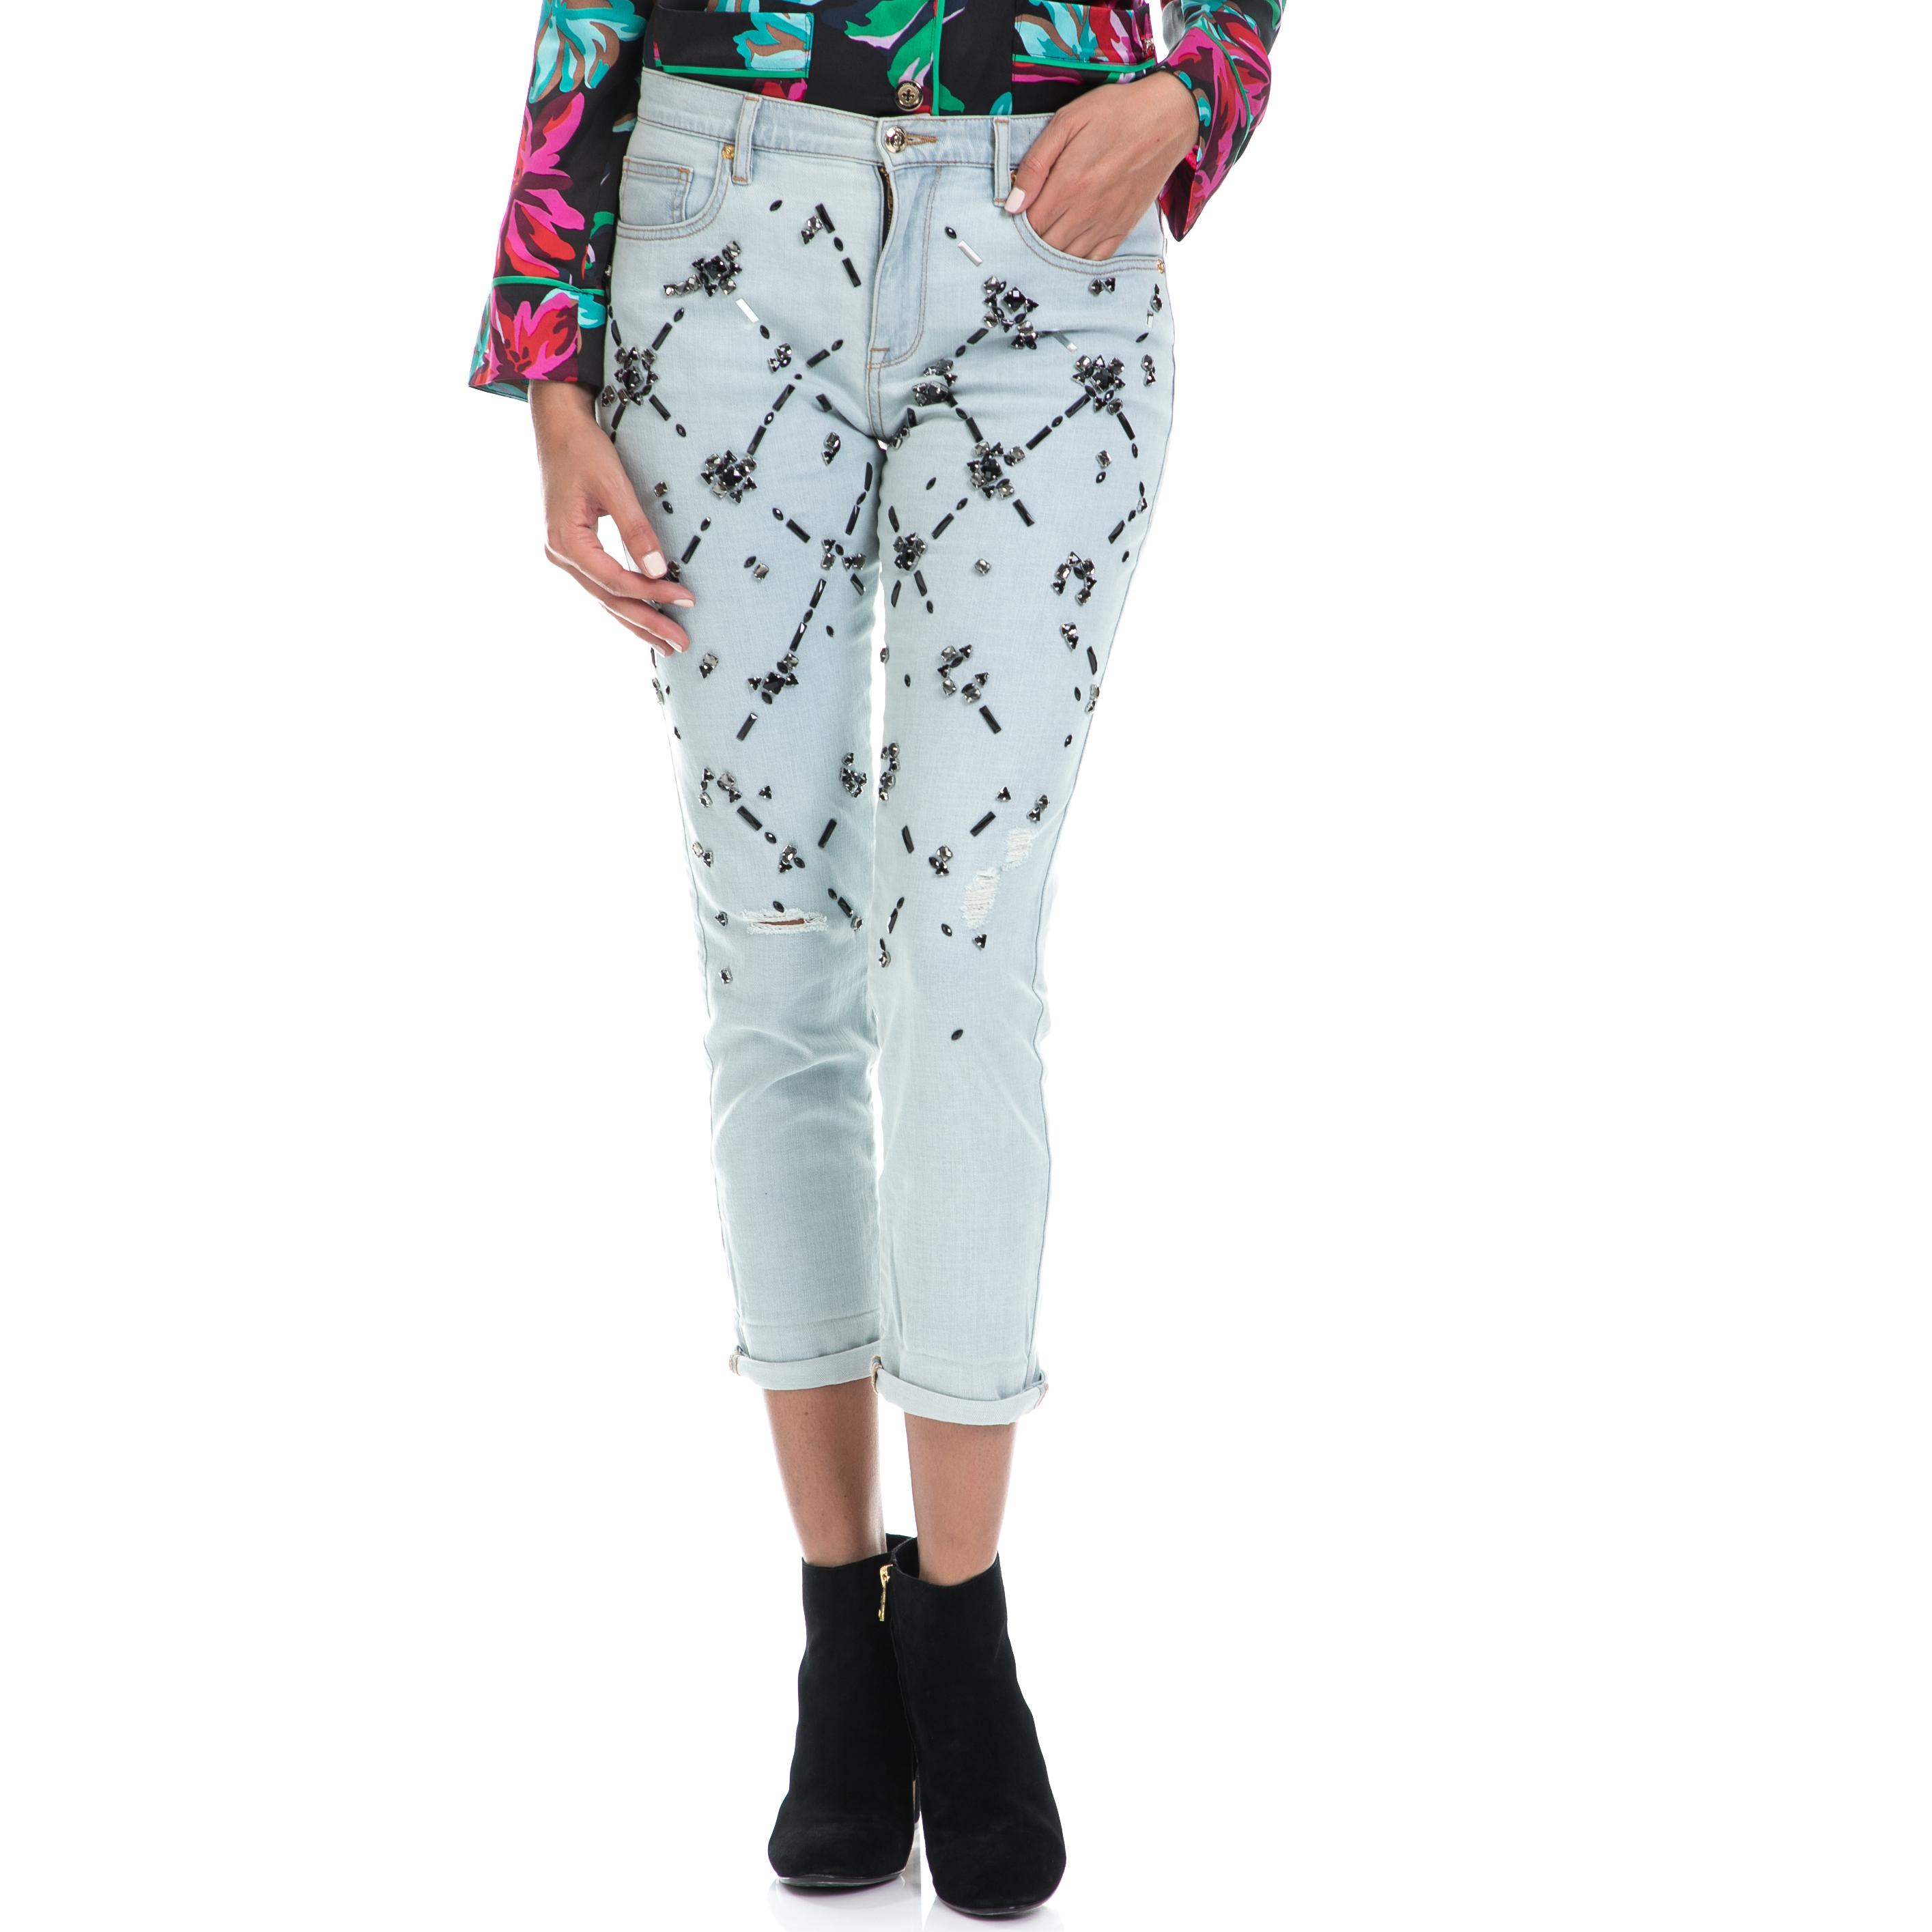 JUICY COUTURE – Γυναικείο τζιν παντελόνι JUICY COUTURE μπλε